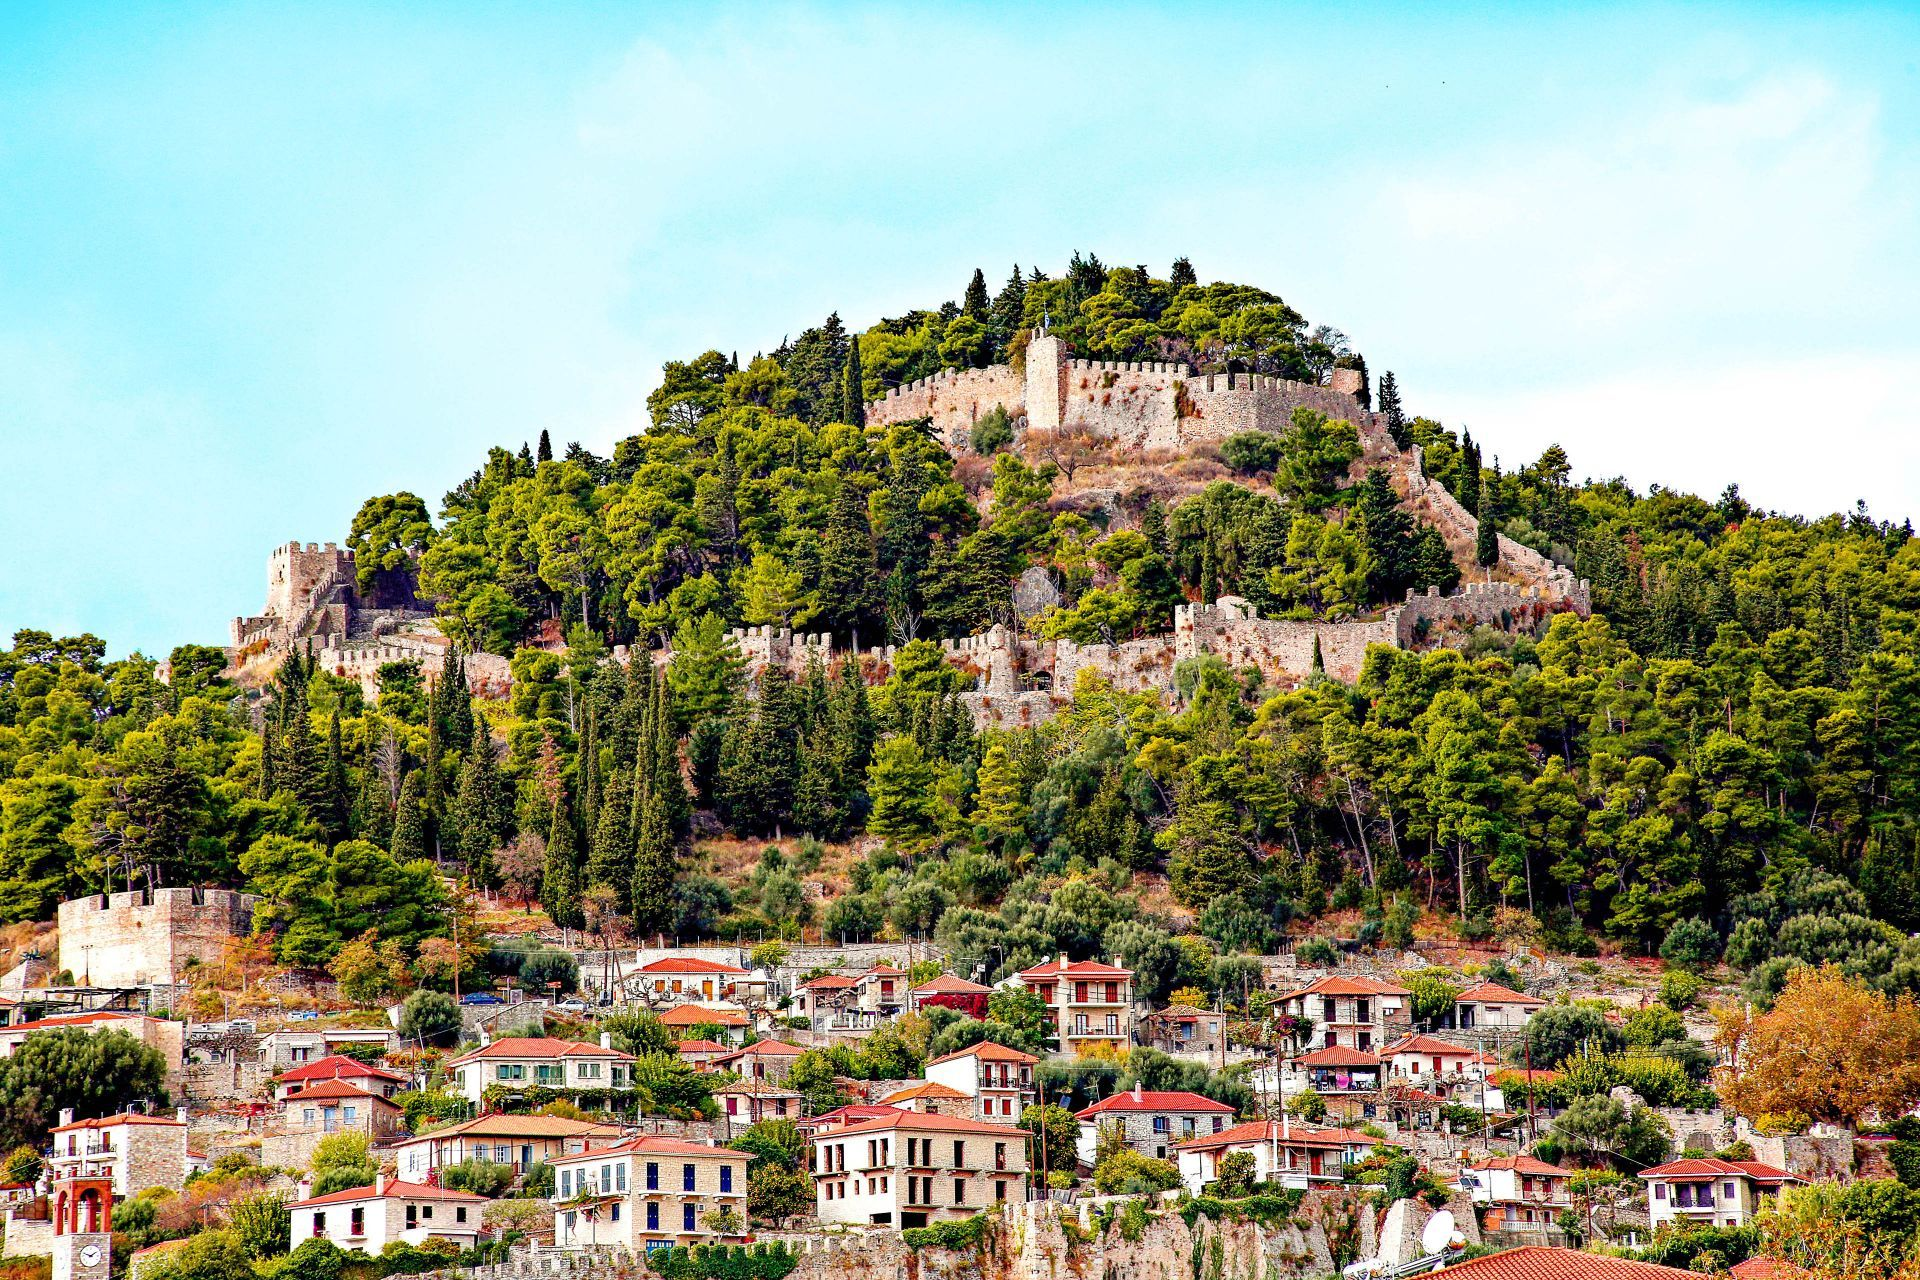 Grecia: sisma di magnitudo 5.0 a largo di Nafpaktos